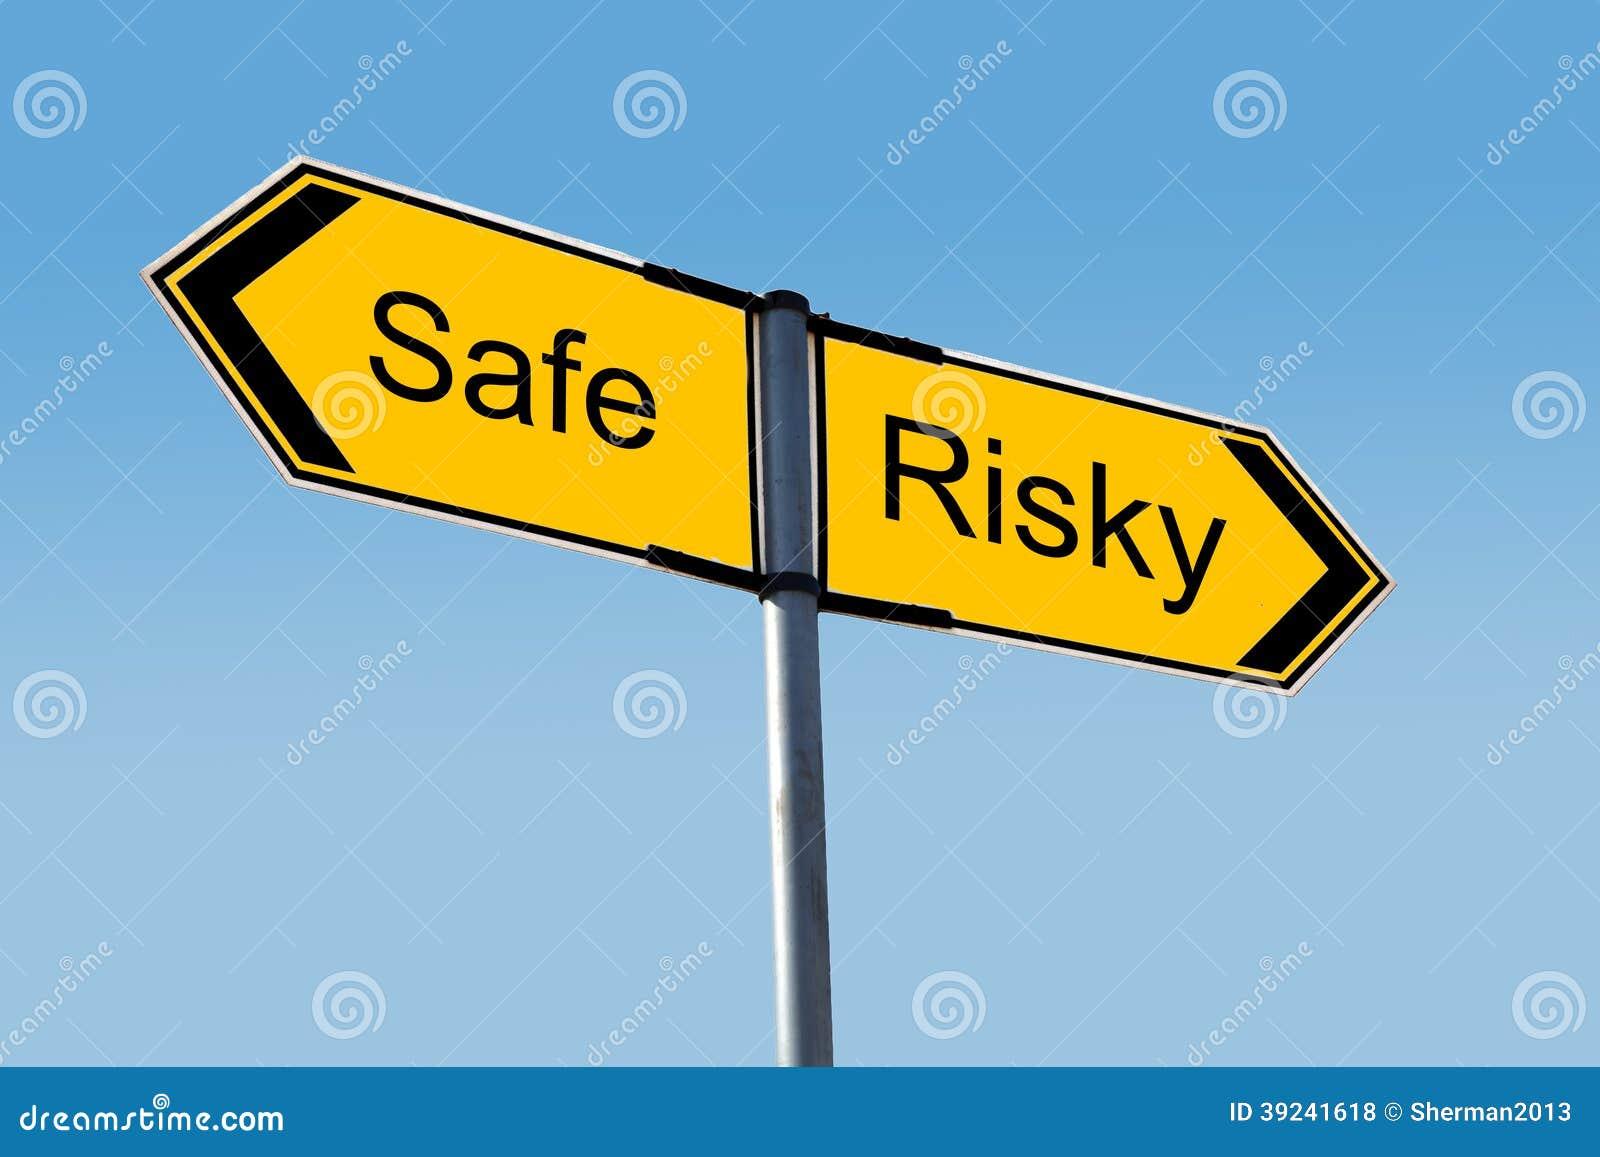 Riskant